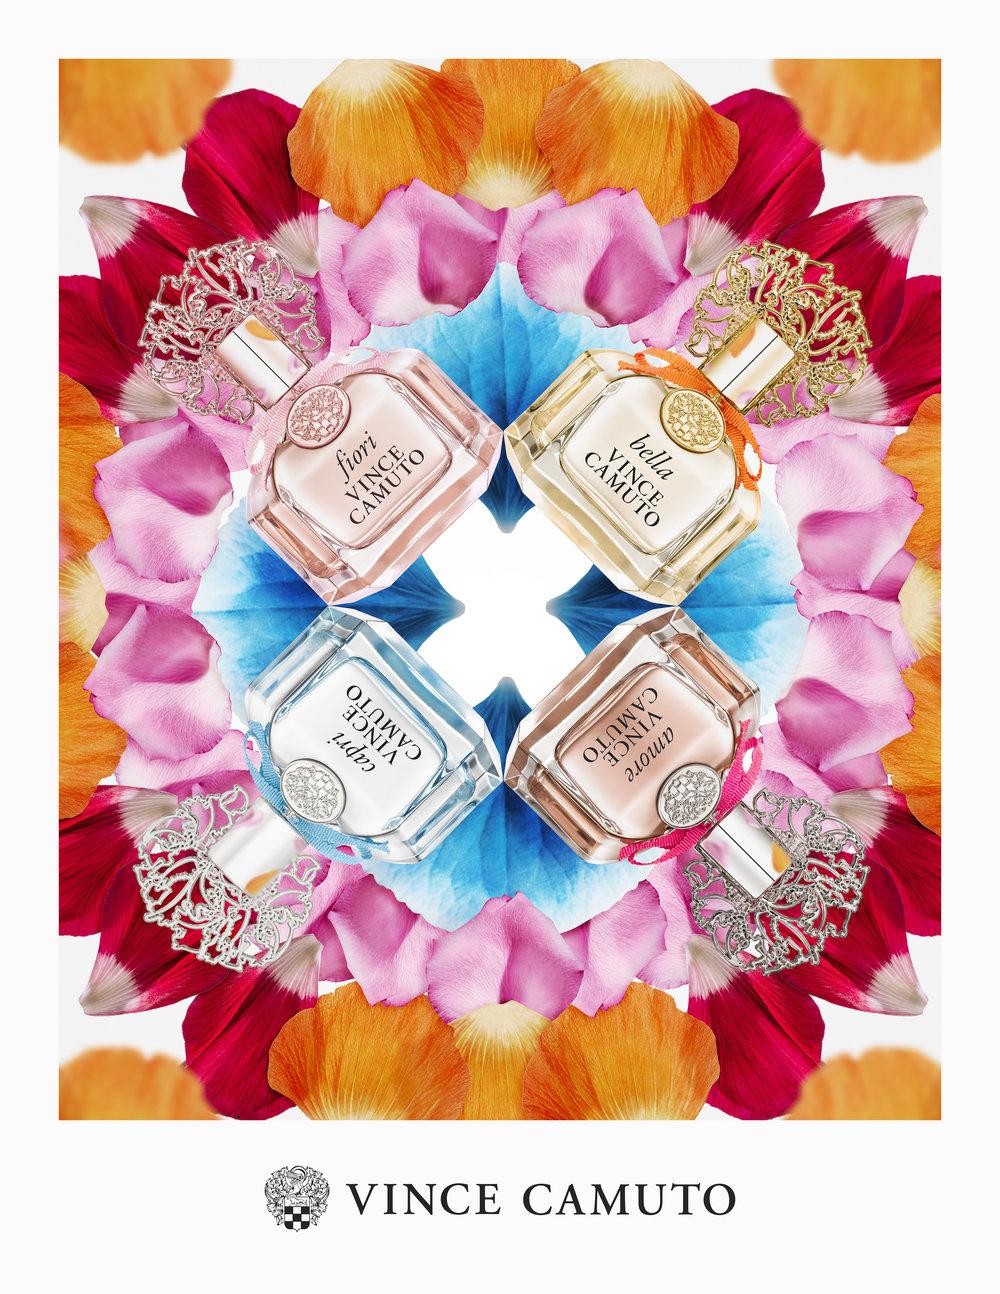 Vince-Camuto-Garden-Series-Fragrance-Ad-by-Timothy-Hogan_MF.jpg